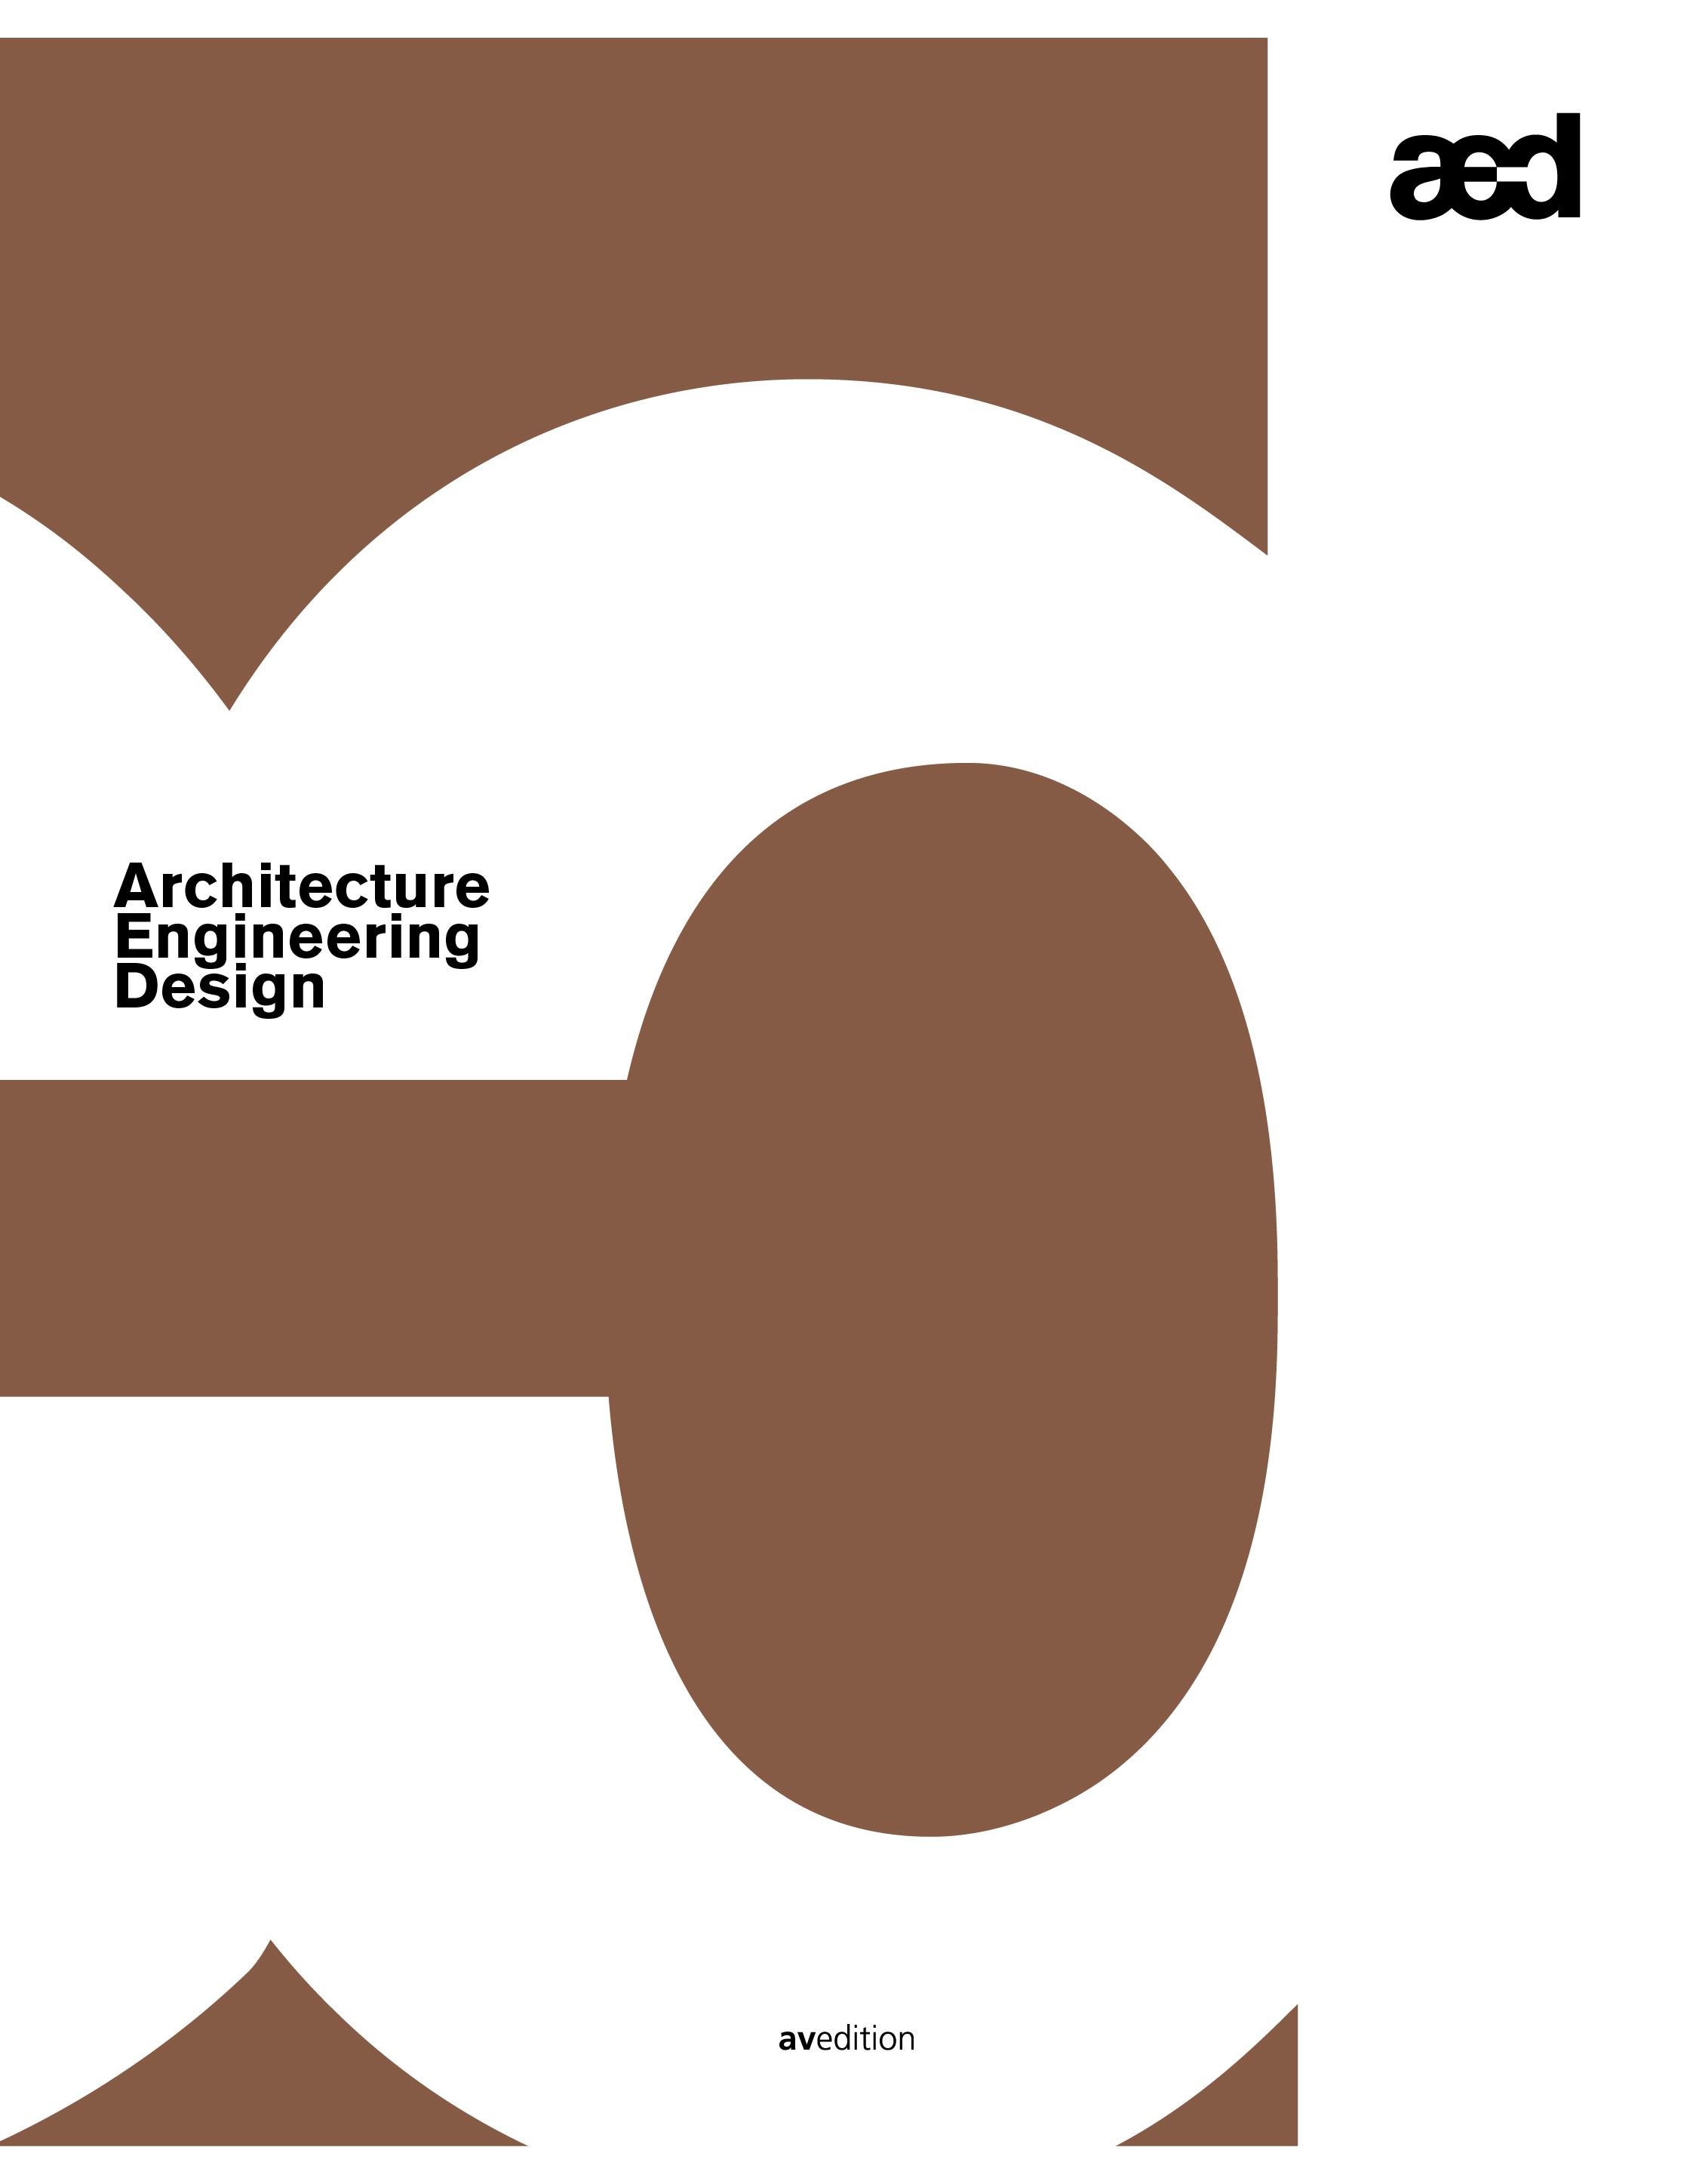 Architecture, Engineering, Design